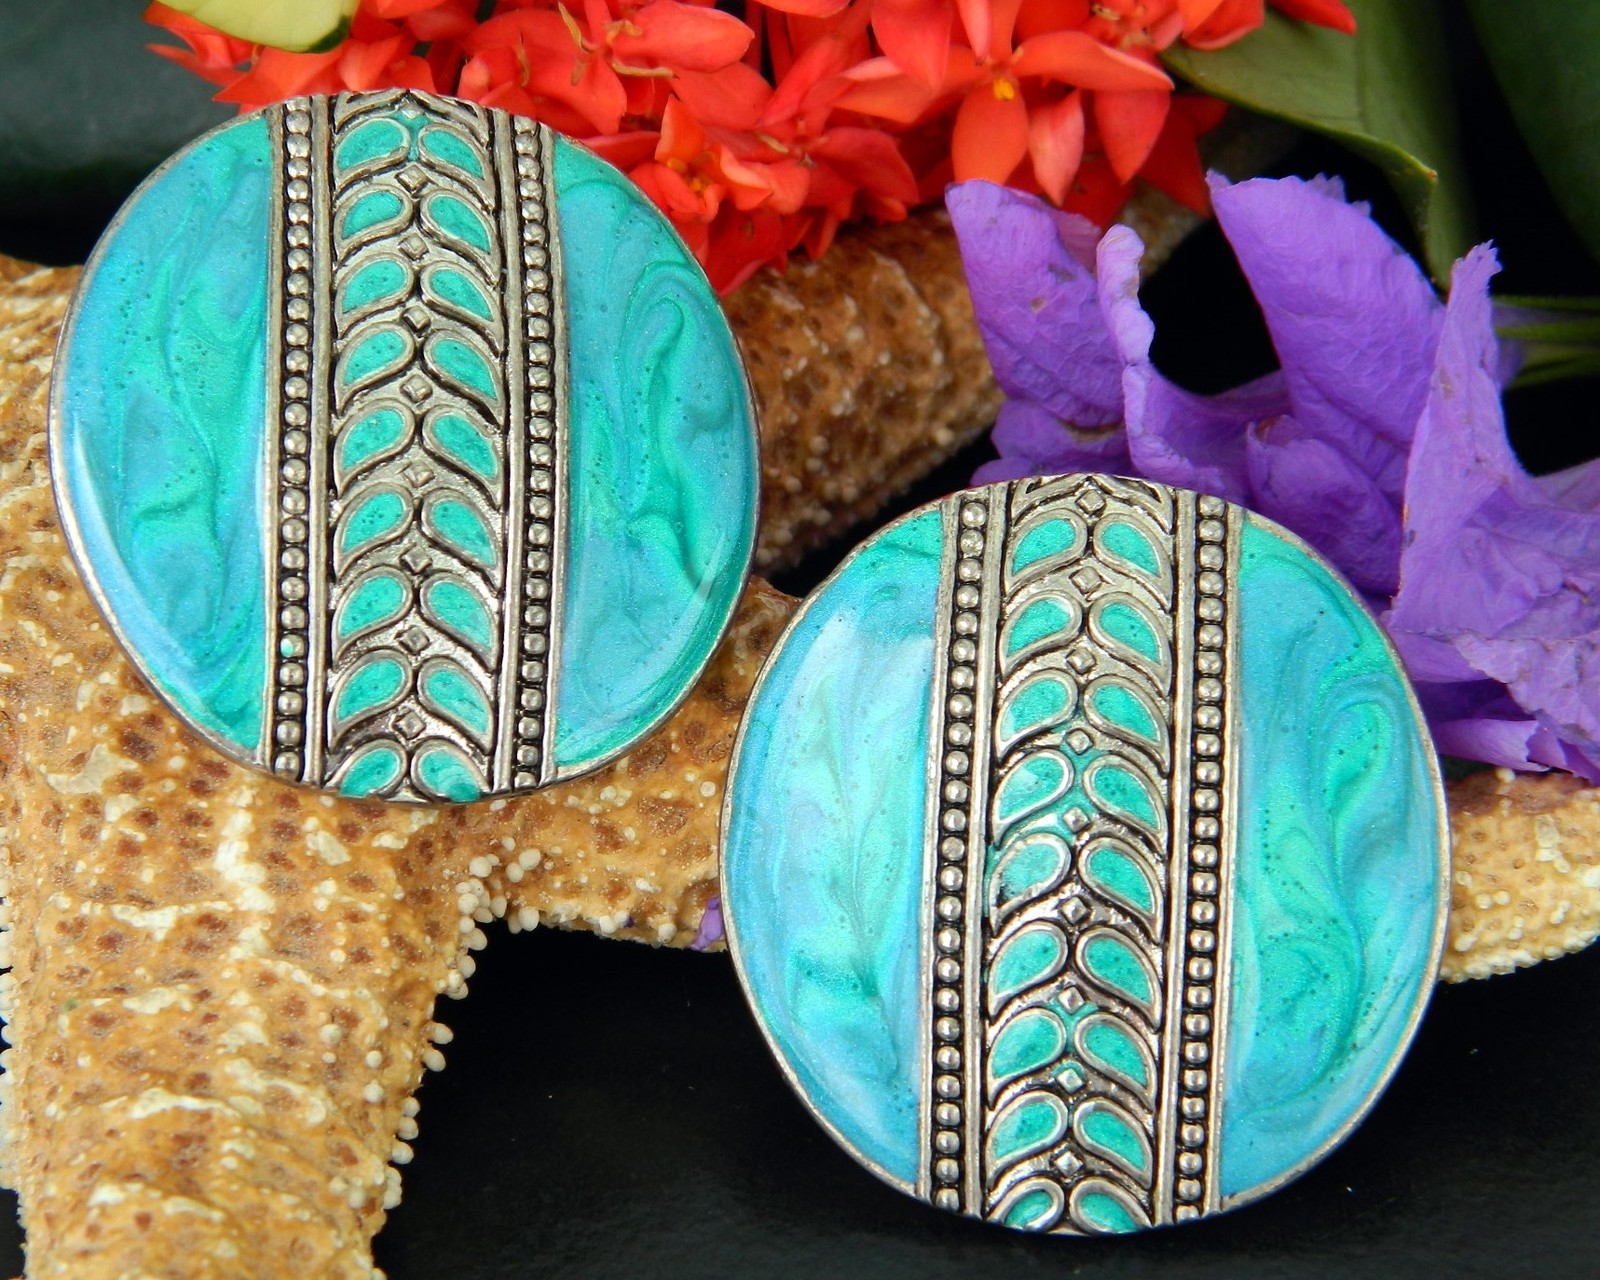 Vintage Edgar Berebi Earrings Turquoise Enamel Round Disc Pierced